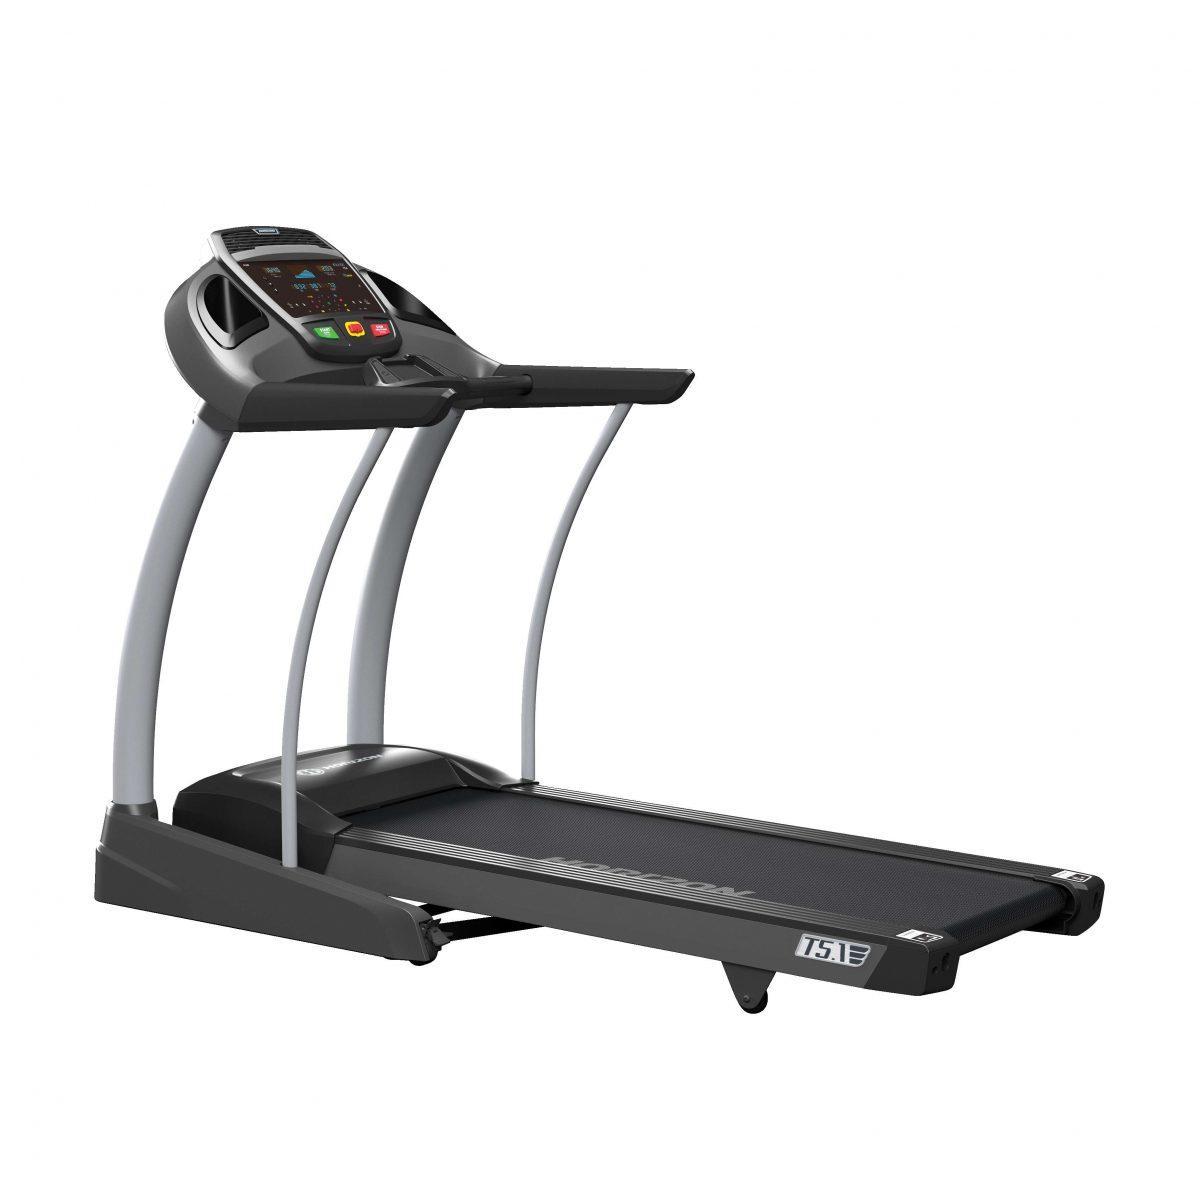 "Horizon Fitness Laufband ""Elite T5.1 Viewfit"" - Fitnessgeräte - Horizon Fitness"